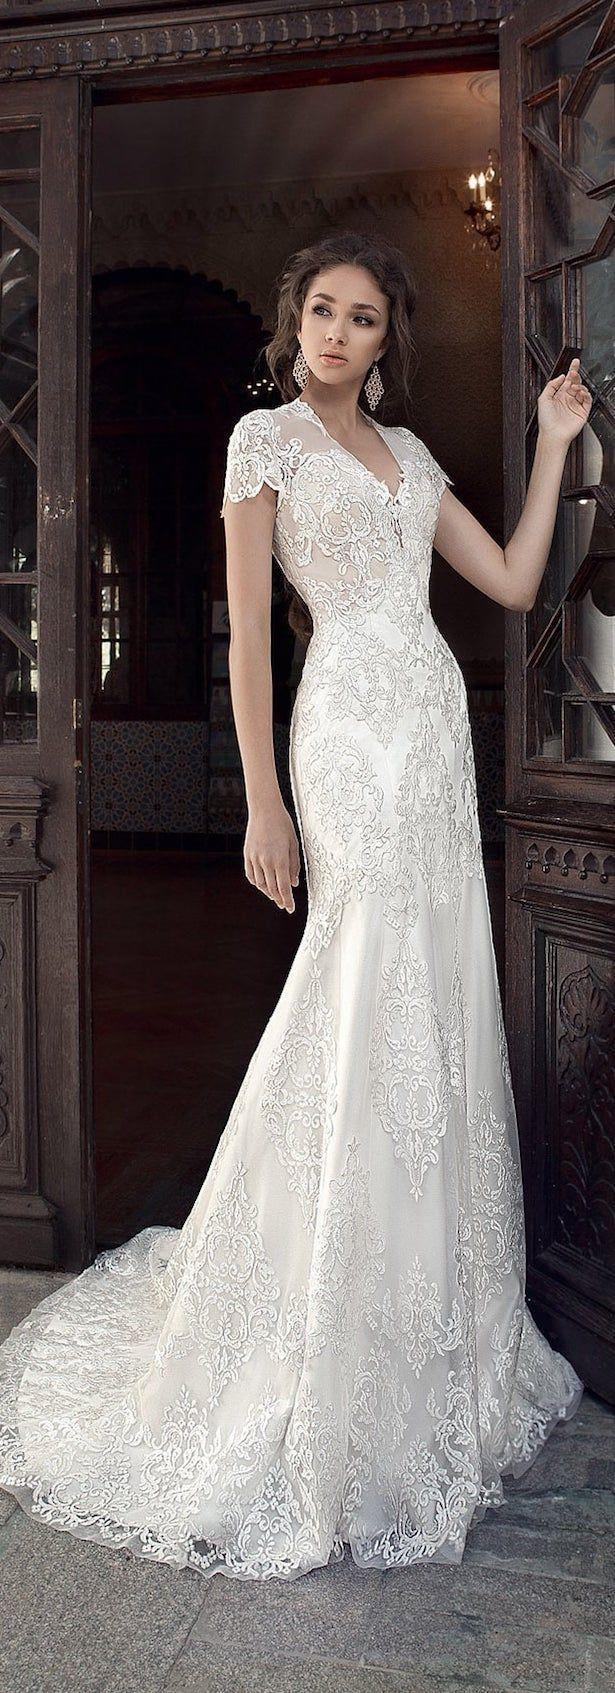 Milva 2017 Wedding Dresses – Sunrise Collection - Belle ...